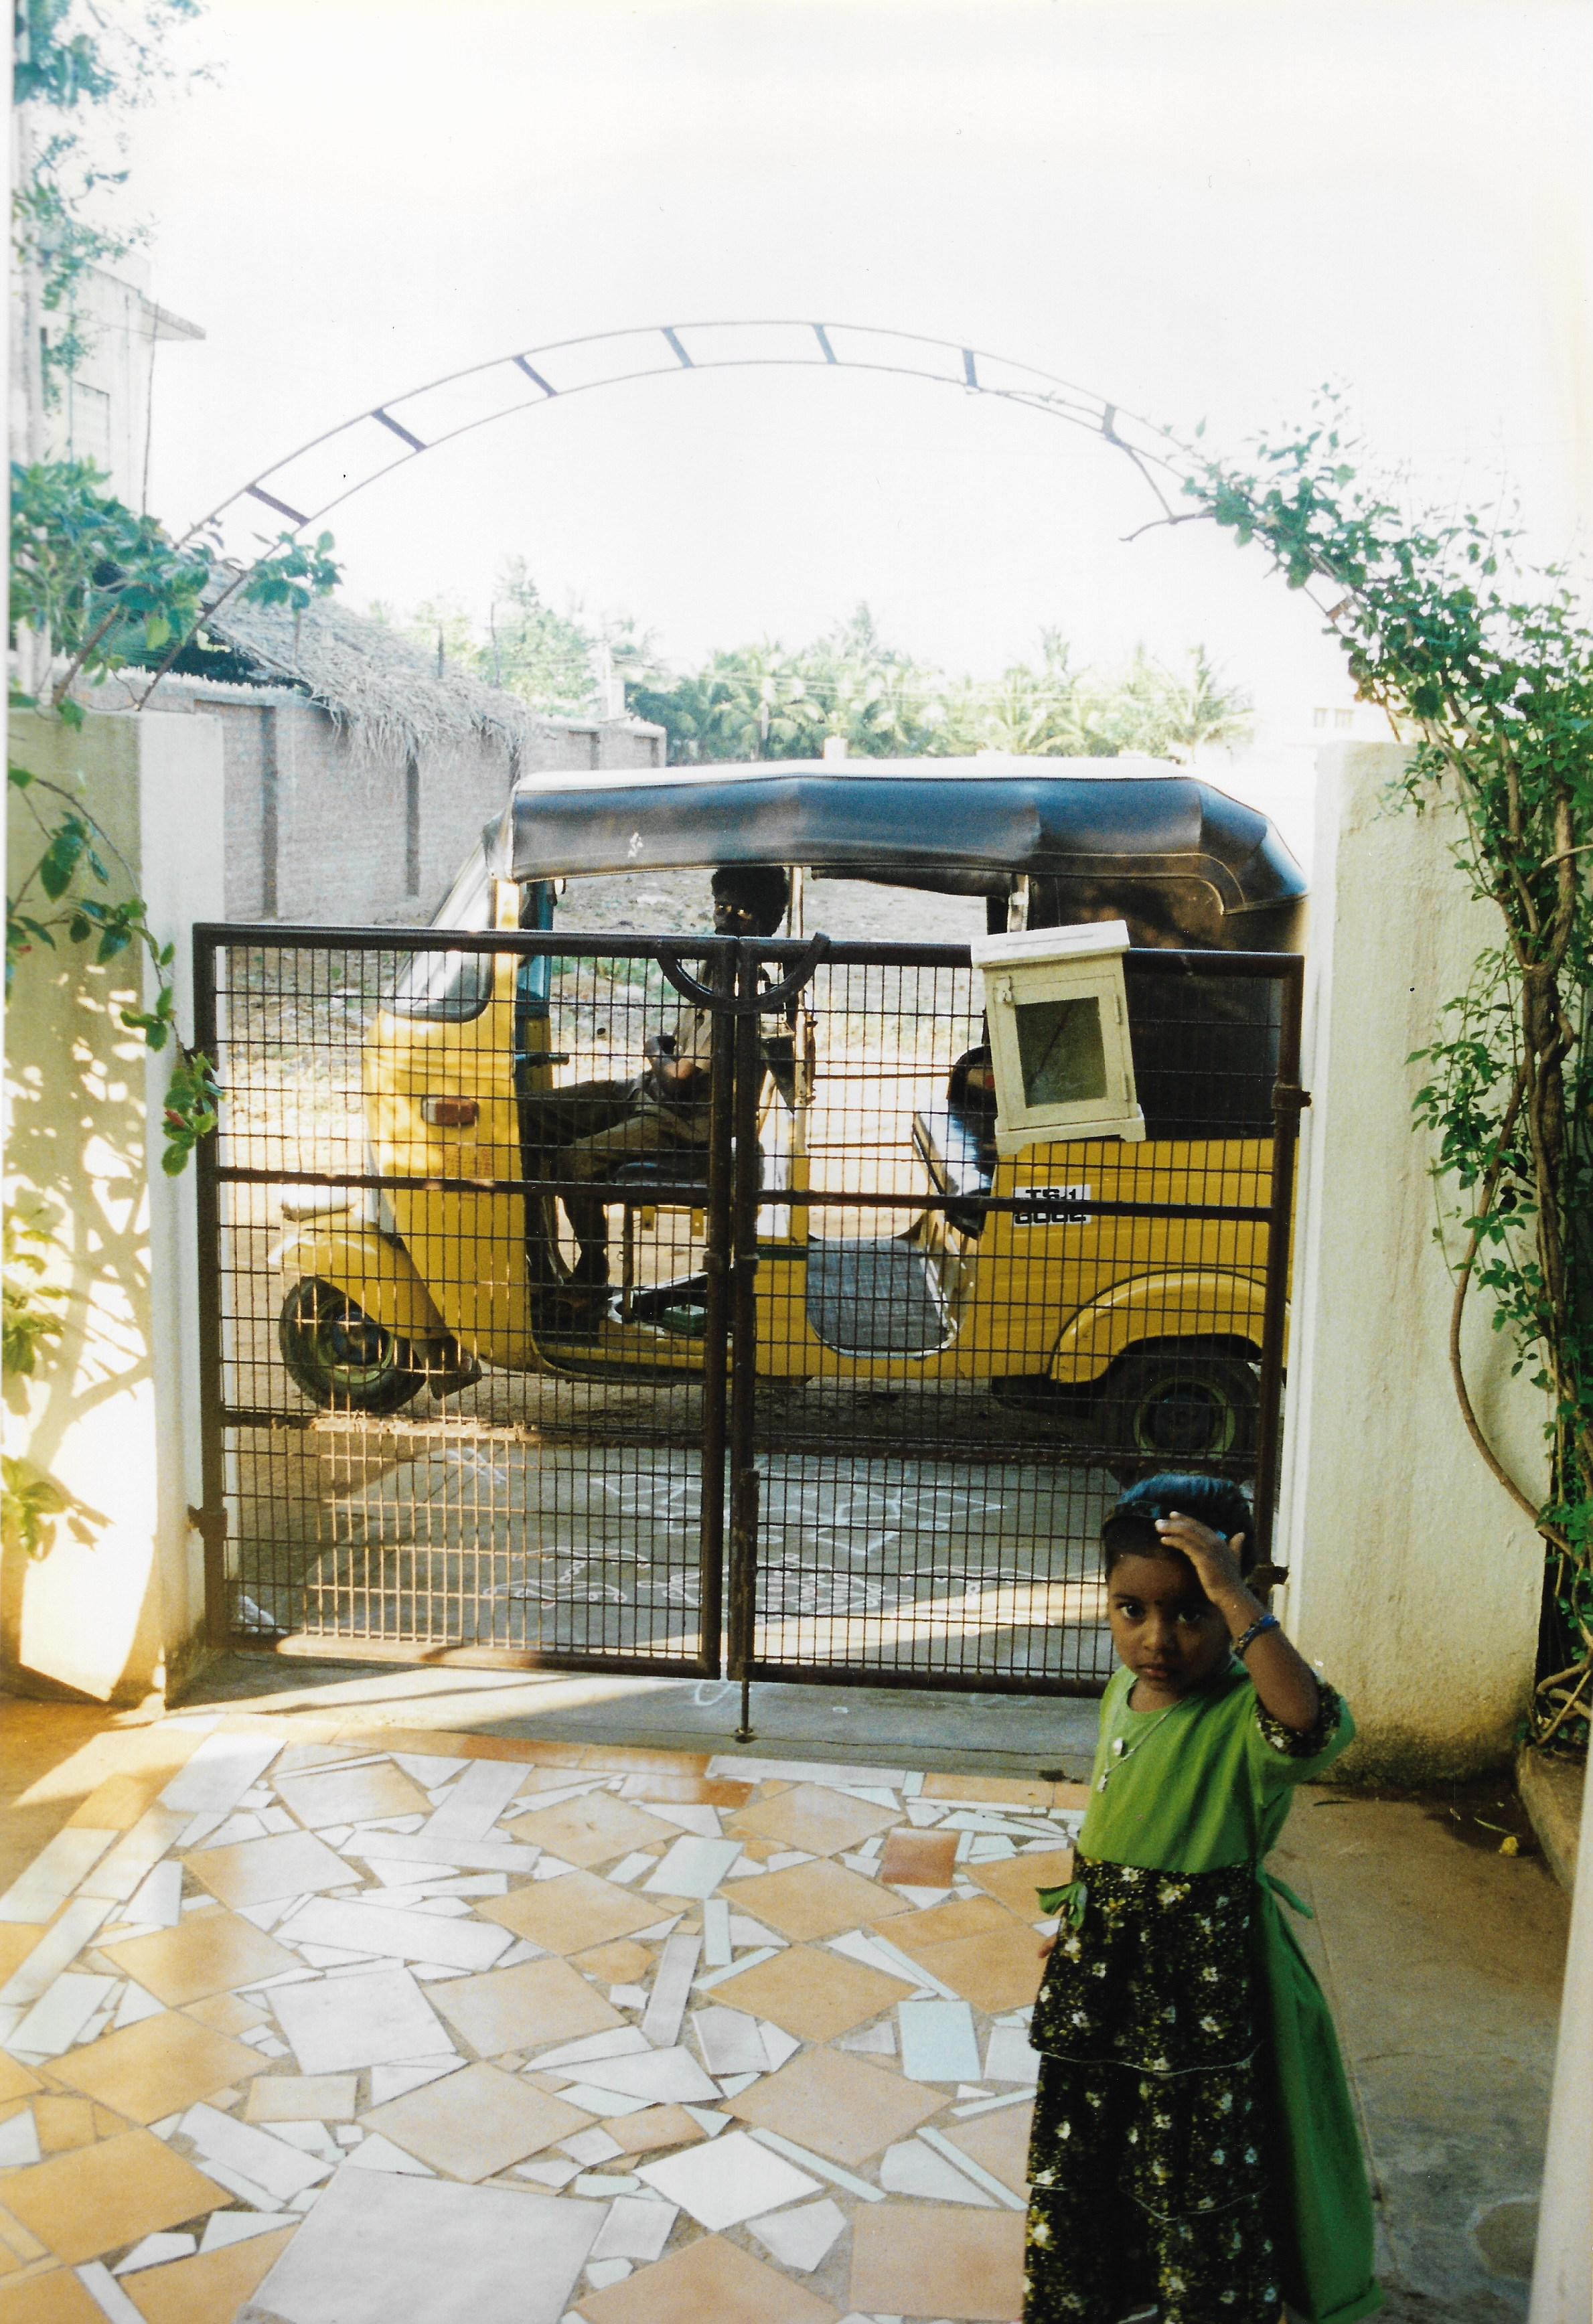 MA-Chennai1995 1.jpeg